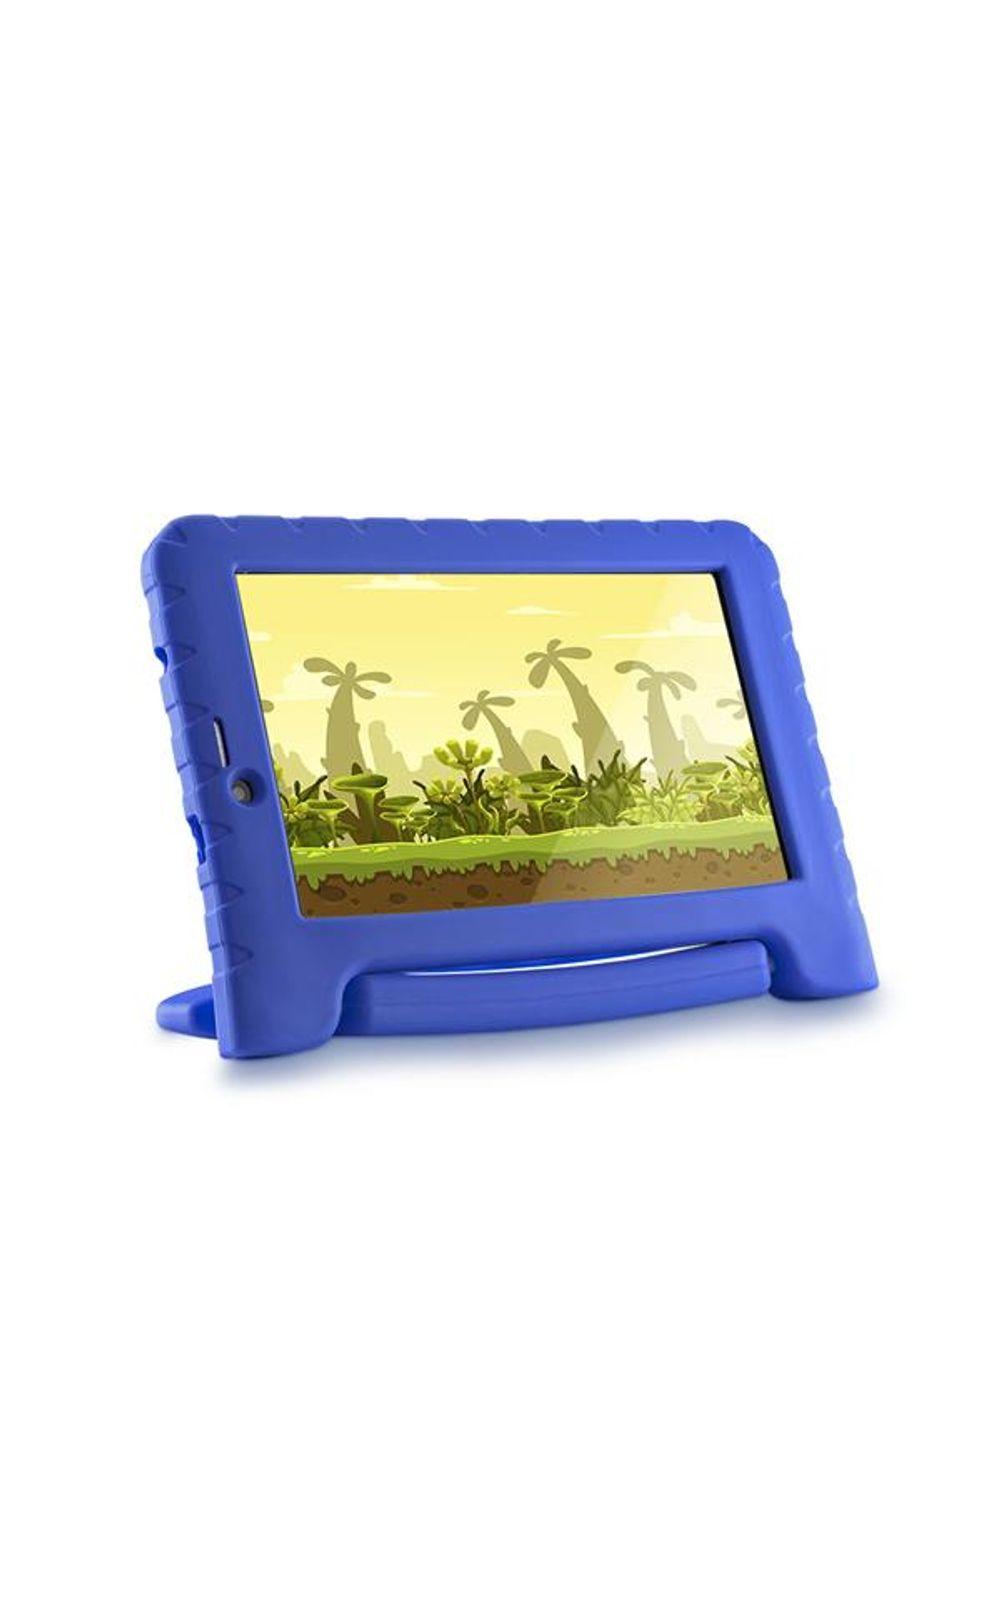 Foto 2 - Tablet Multilaser Kid Pad 3G Plus Azul 1Gb Android 8.1 Oreo Wifi Memória 8Gb Quad Core - NB291